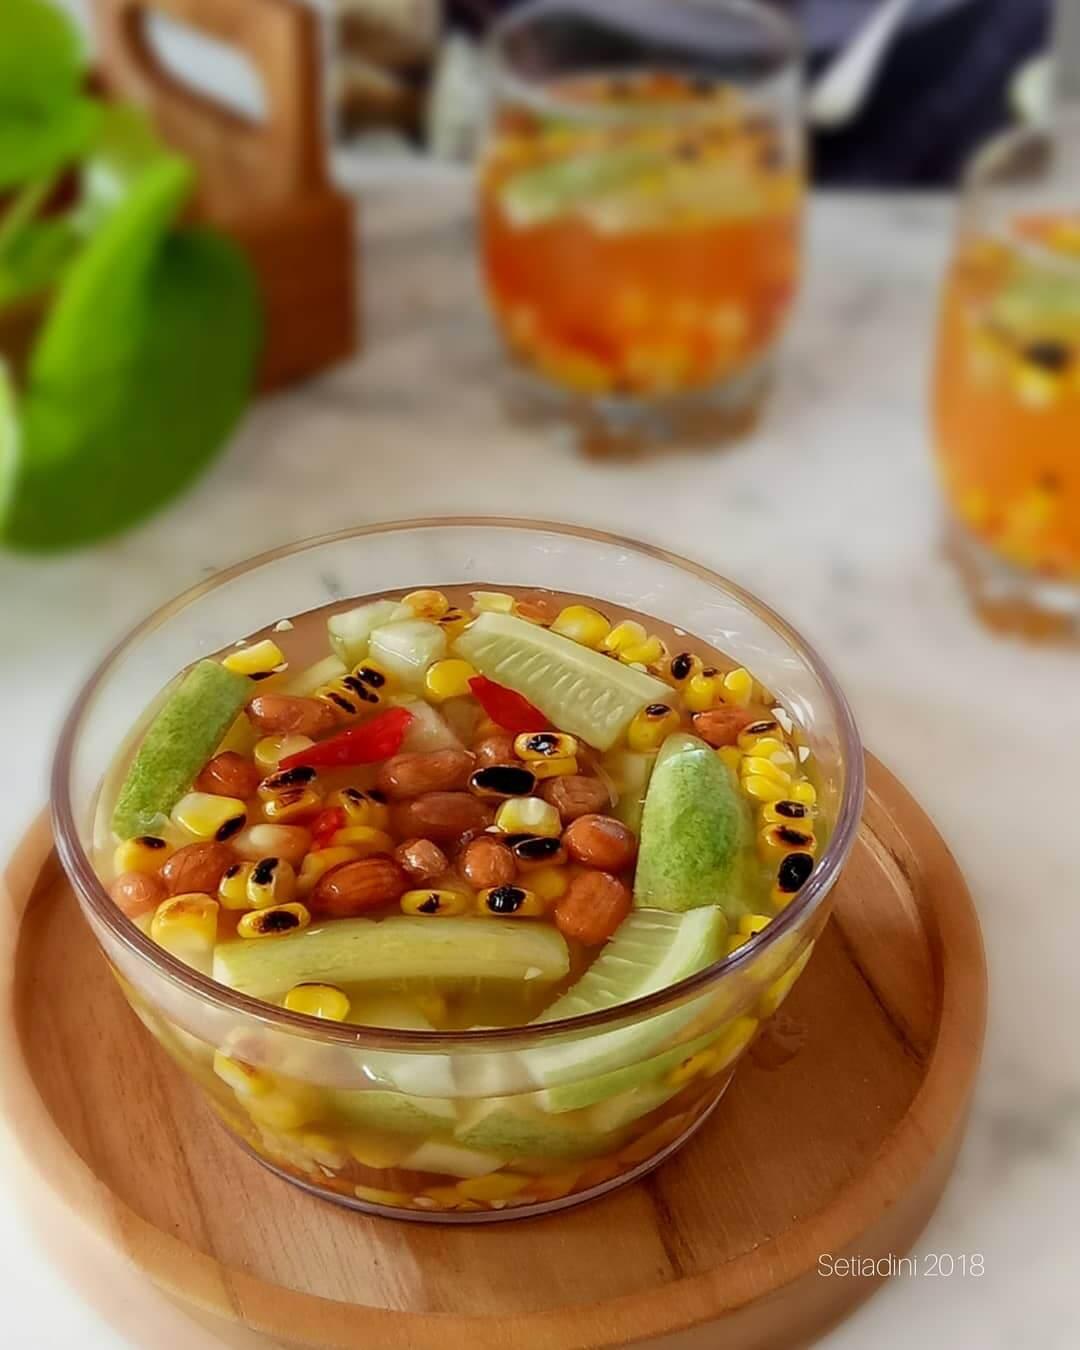 Makanan Khas Bogor : makanan, bogor, Makanan, Bogor, Harga, Rekomendasi, Resto